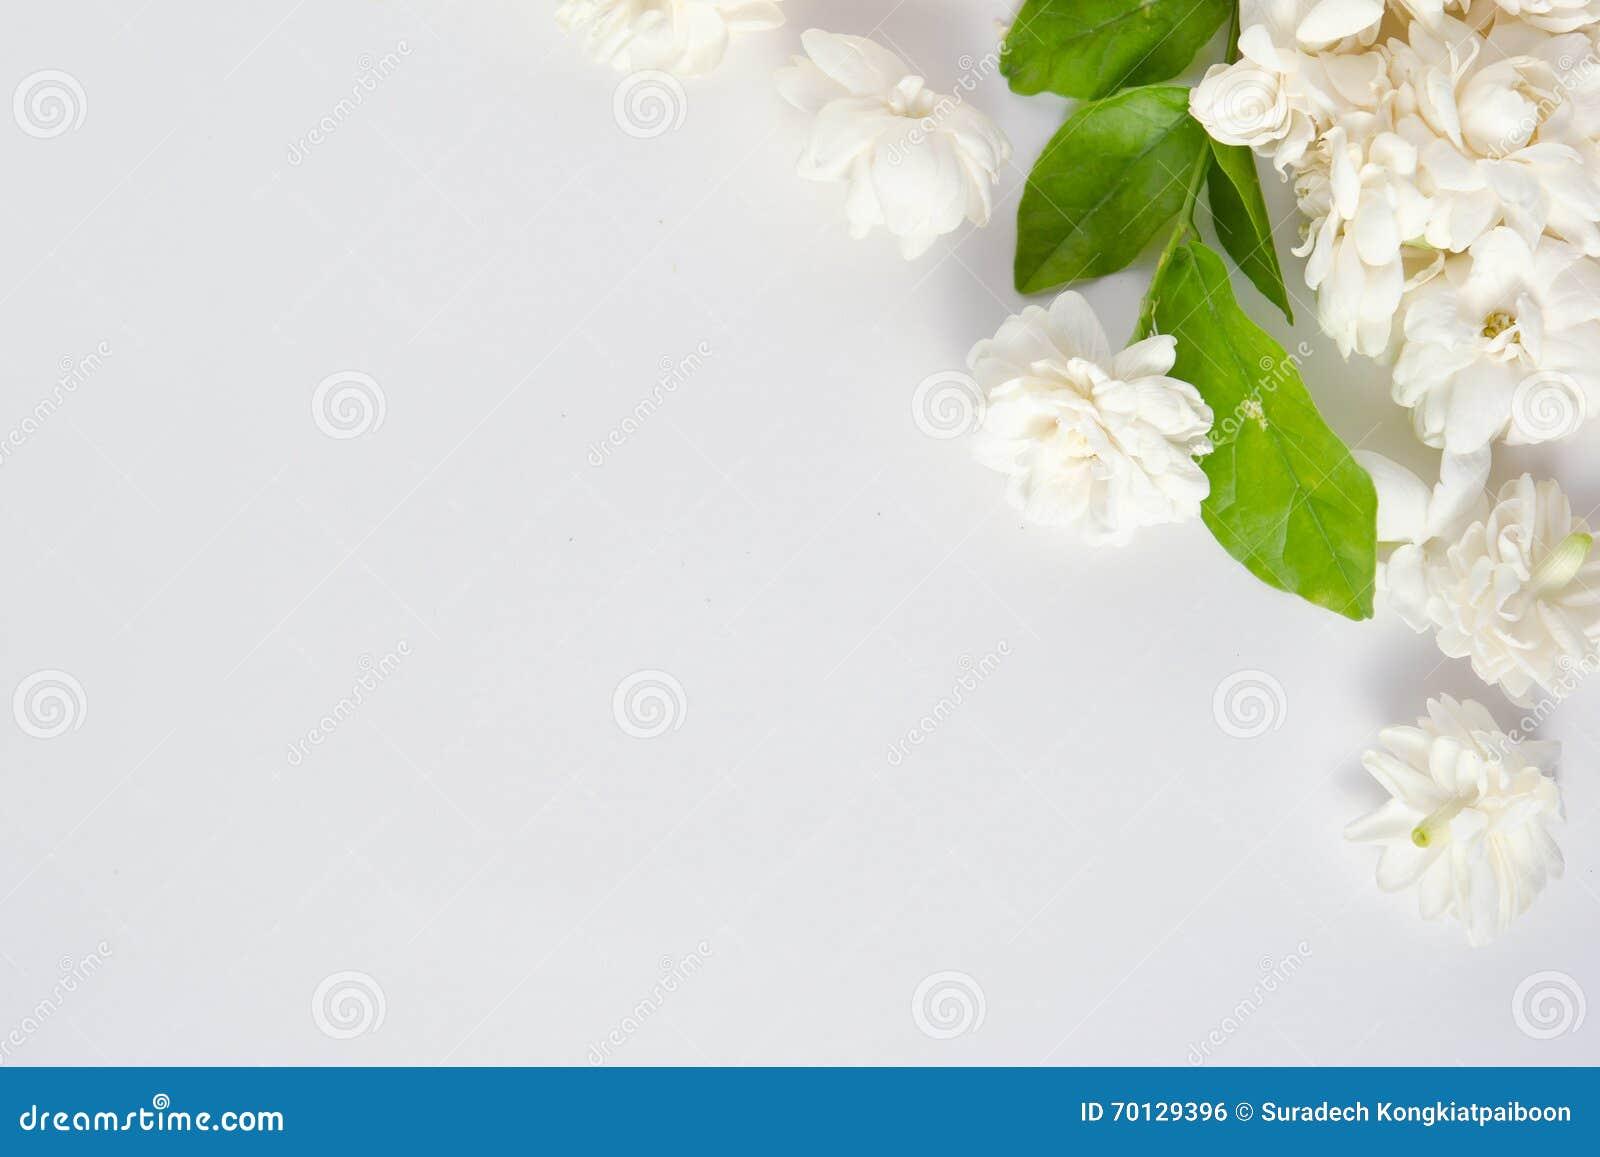 Jasmine Flowers On White Background Stock Photo Image Of Color